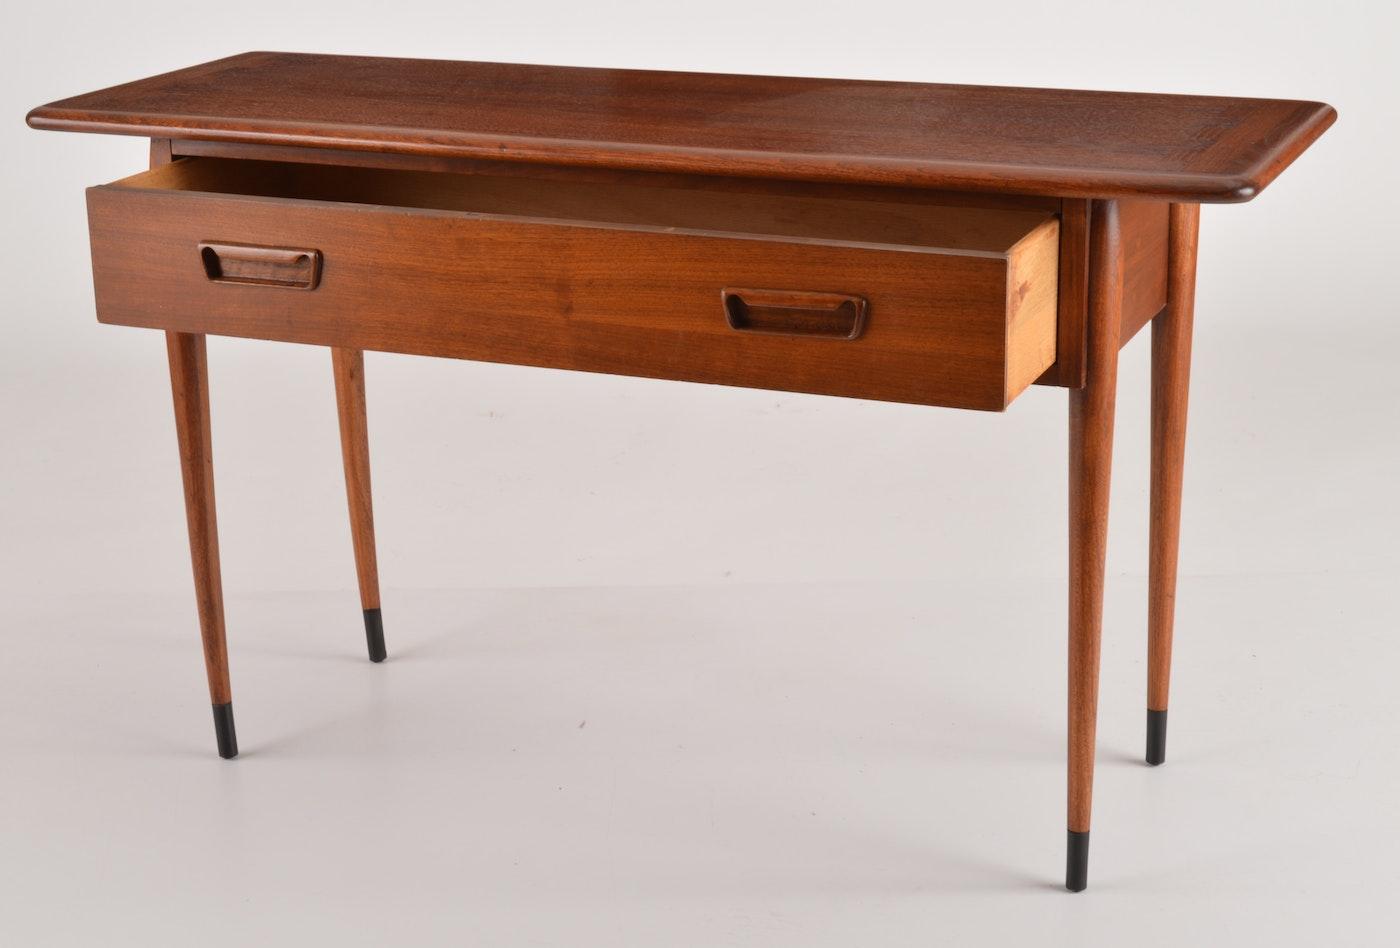 Andre Bus Quot Acclaim Quot Lane Furniture Console Table Ebth